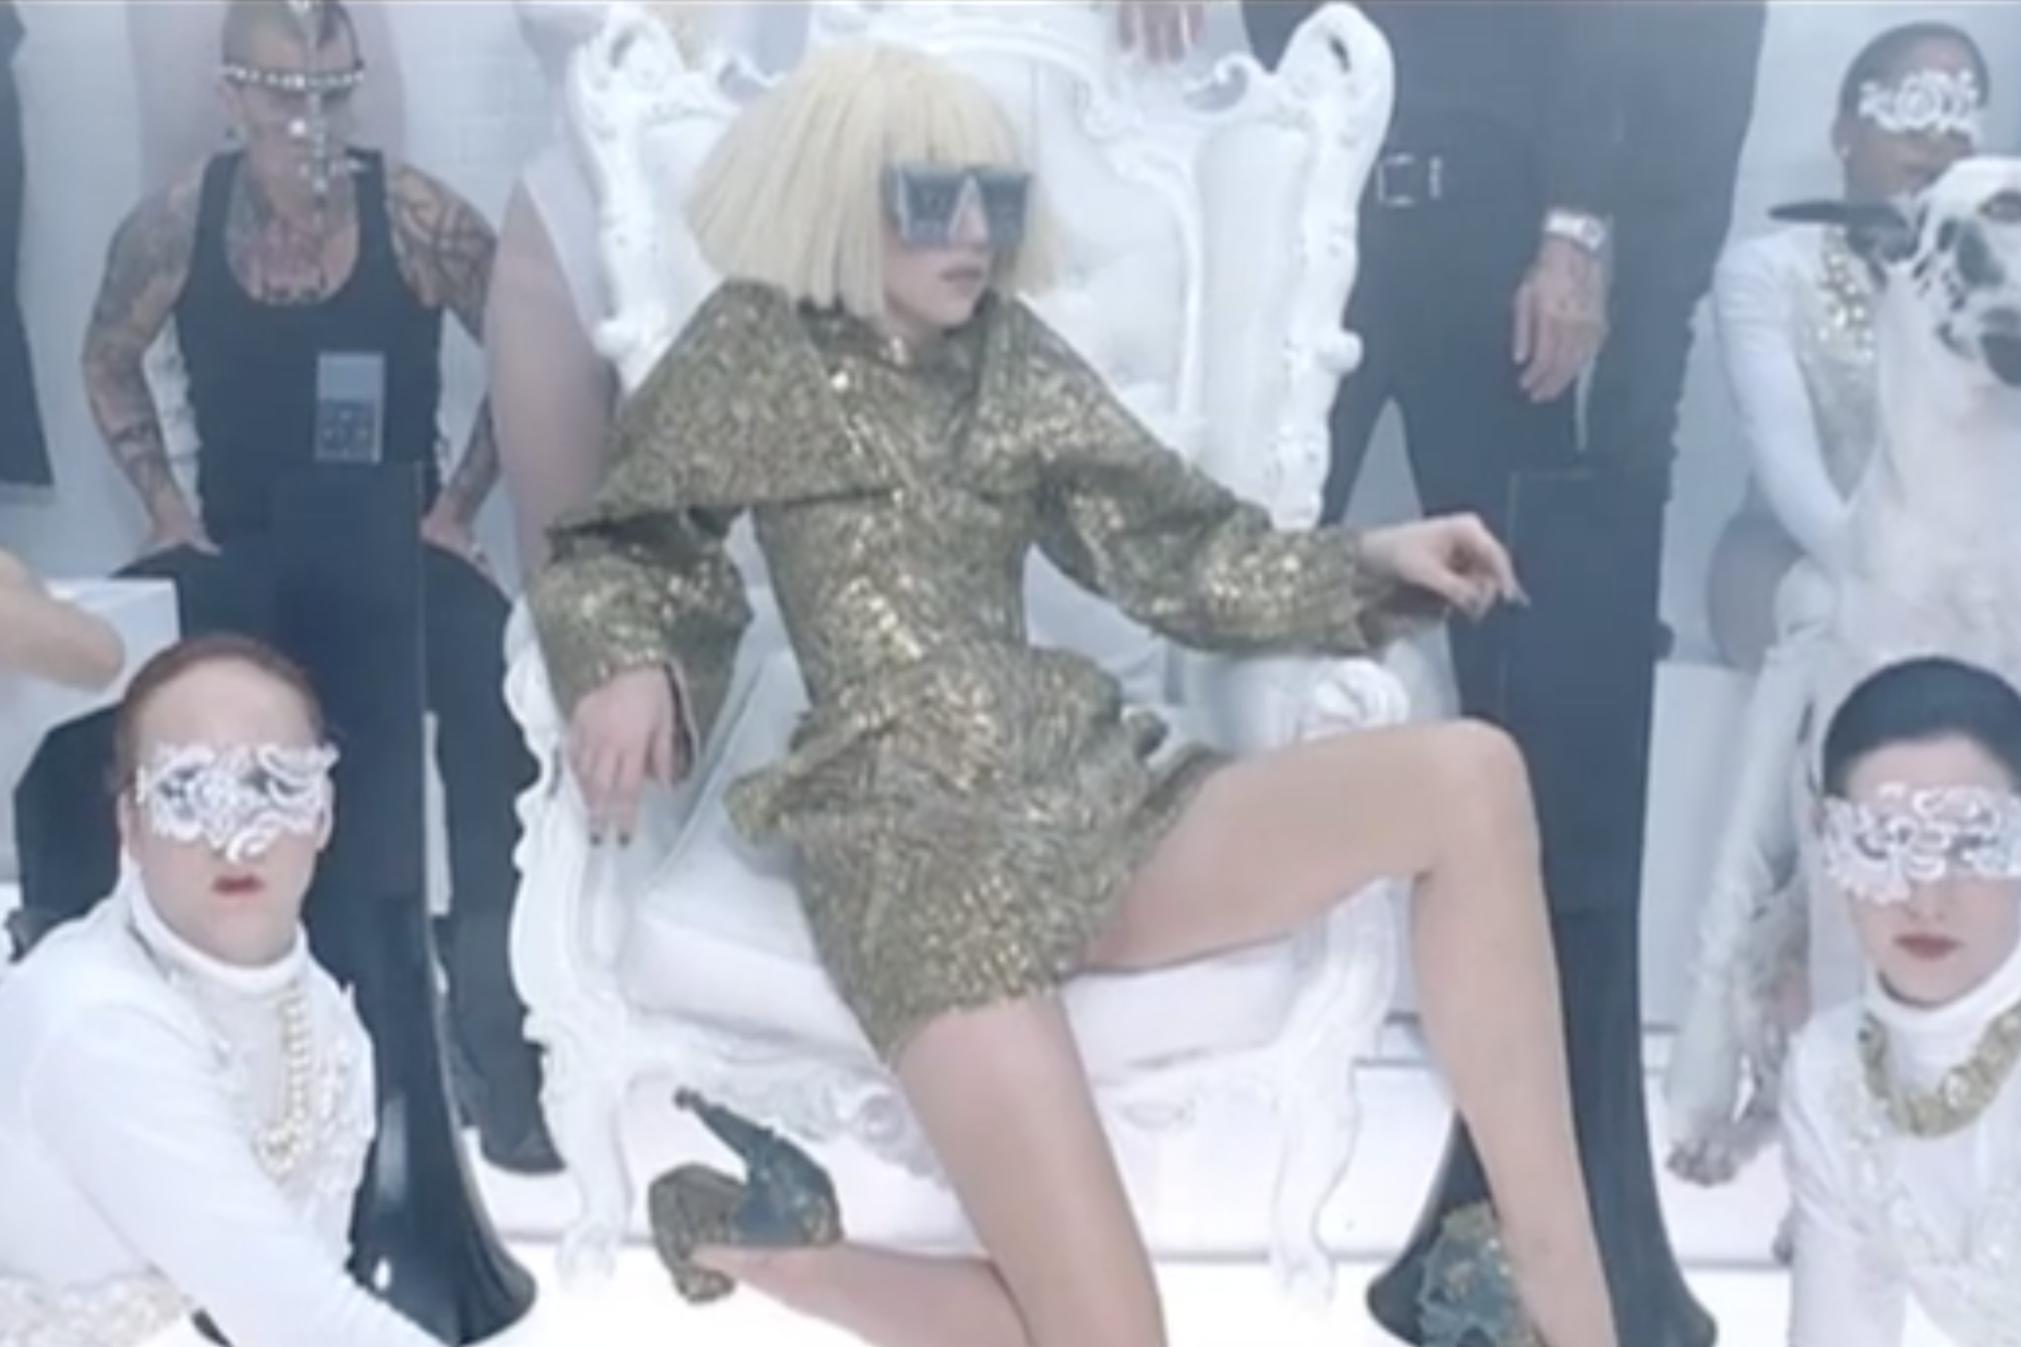 Karin Ferrari, Decoding Lady Gaga's Bad Romance -